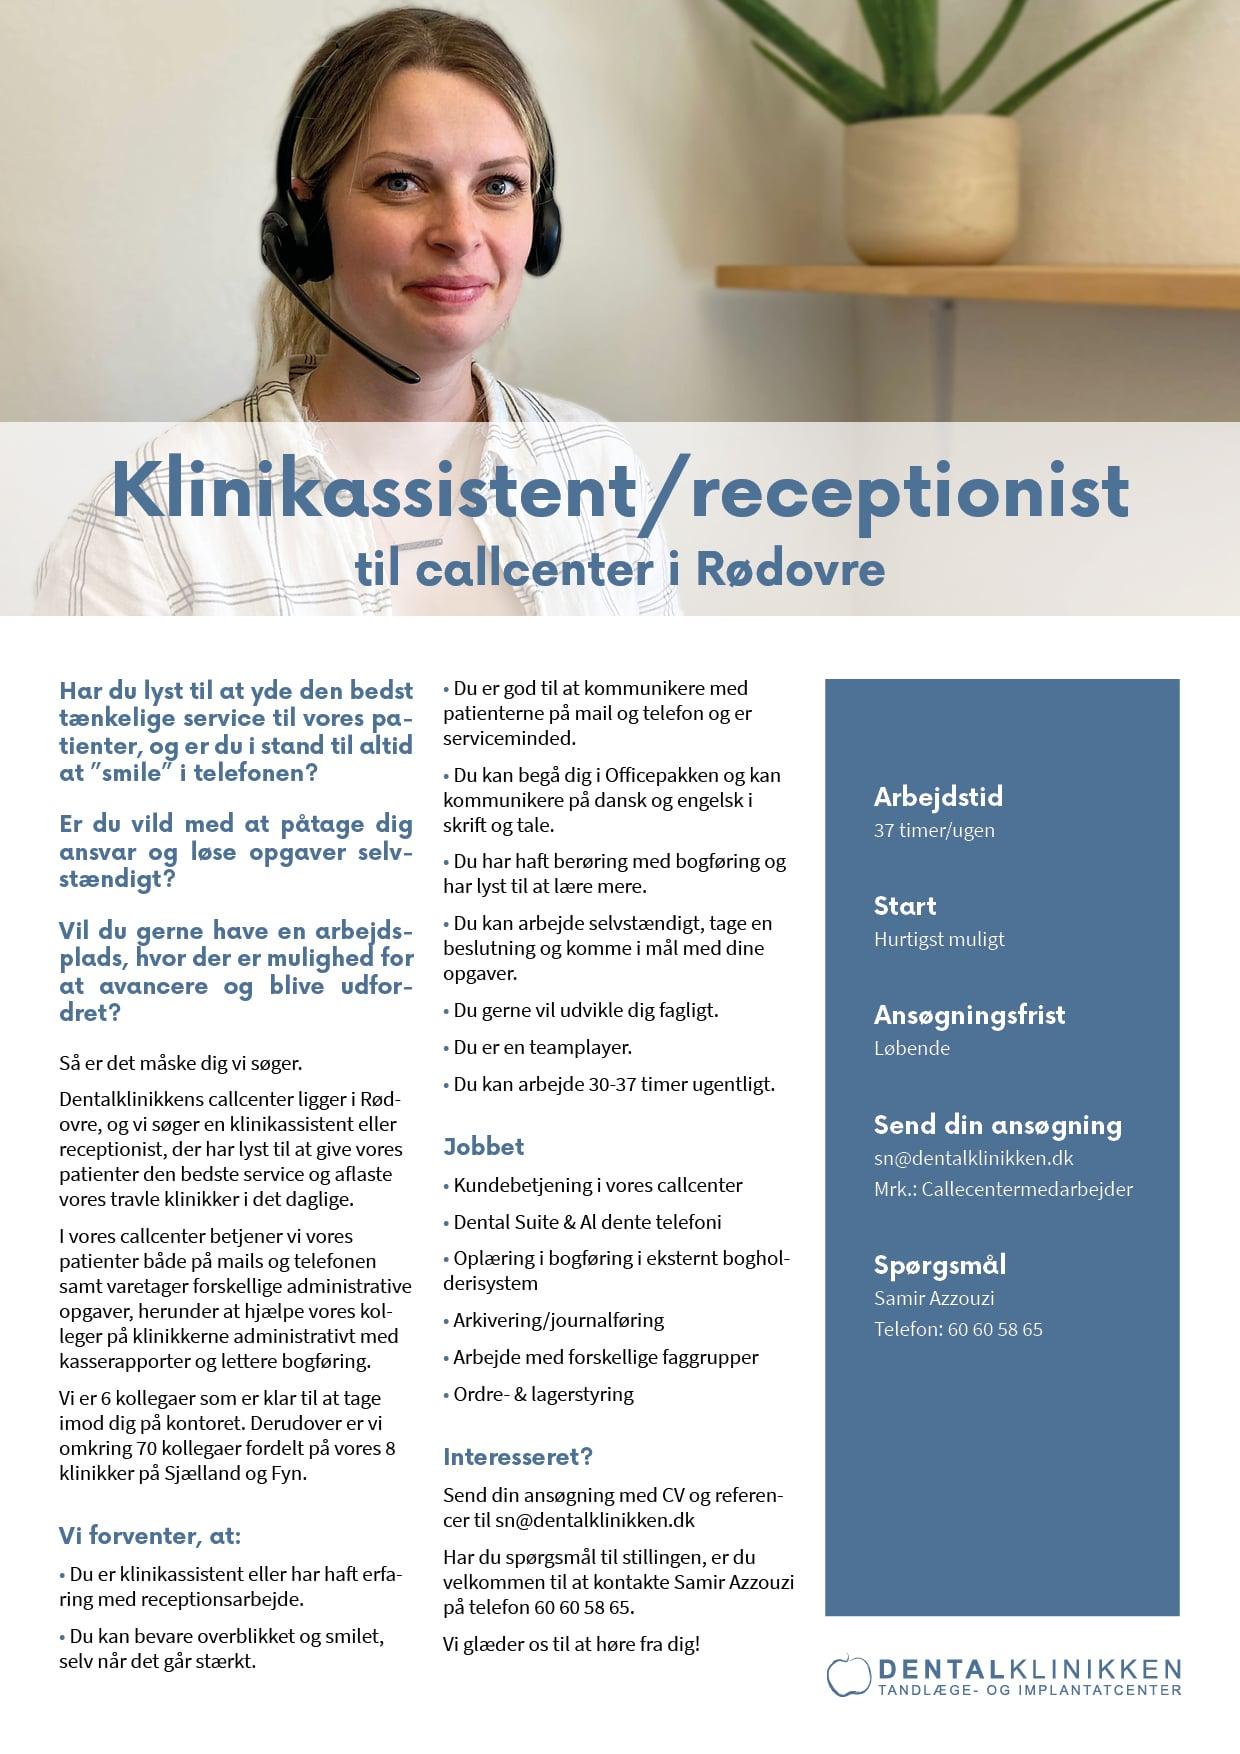 Klinikassistent/receptionist til callcenter